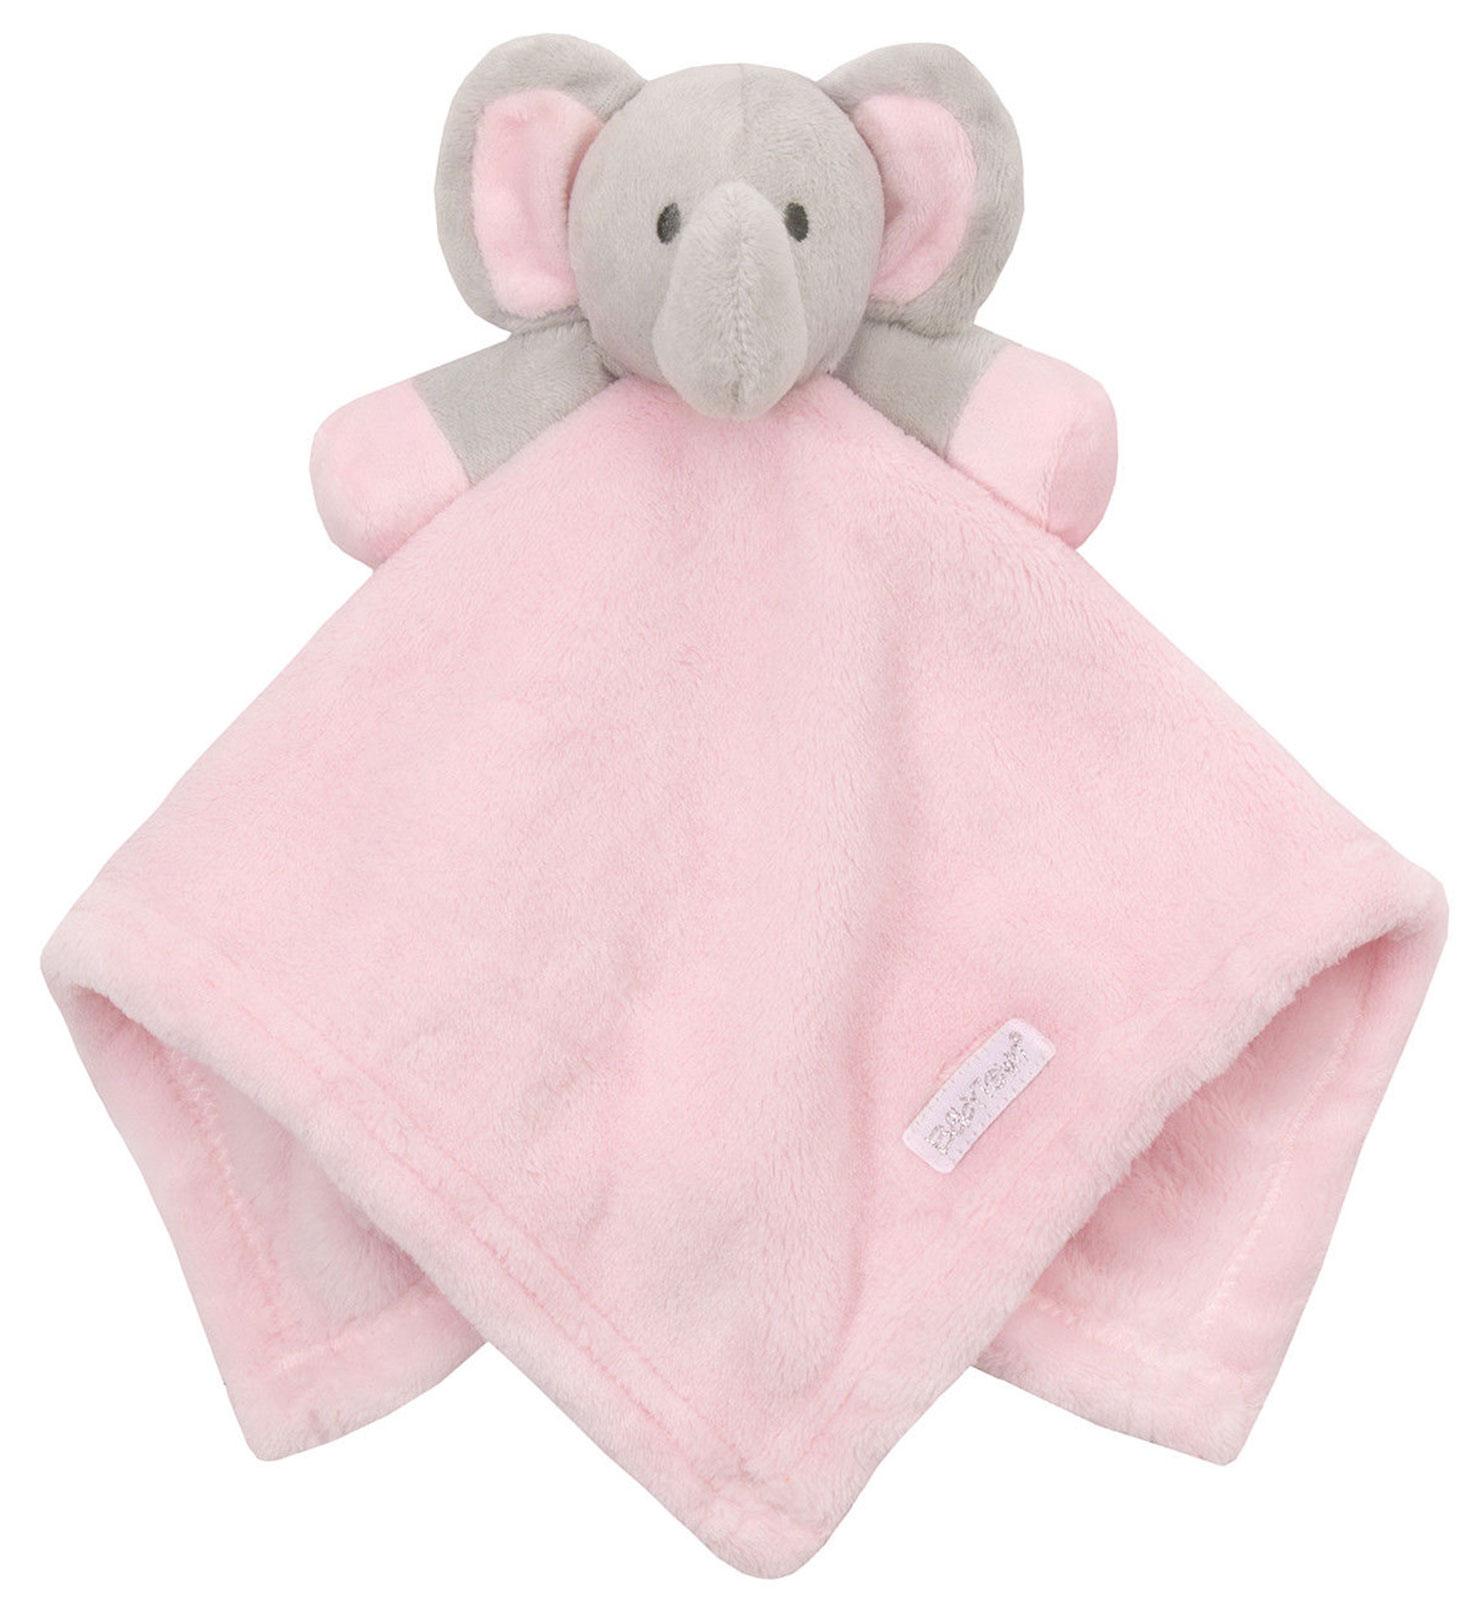 Baby Boys or Girls Comforter Newborn Teddy Bear Unicorn Snuggle Blanket Soft Toy